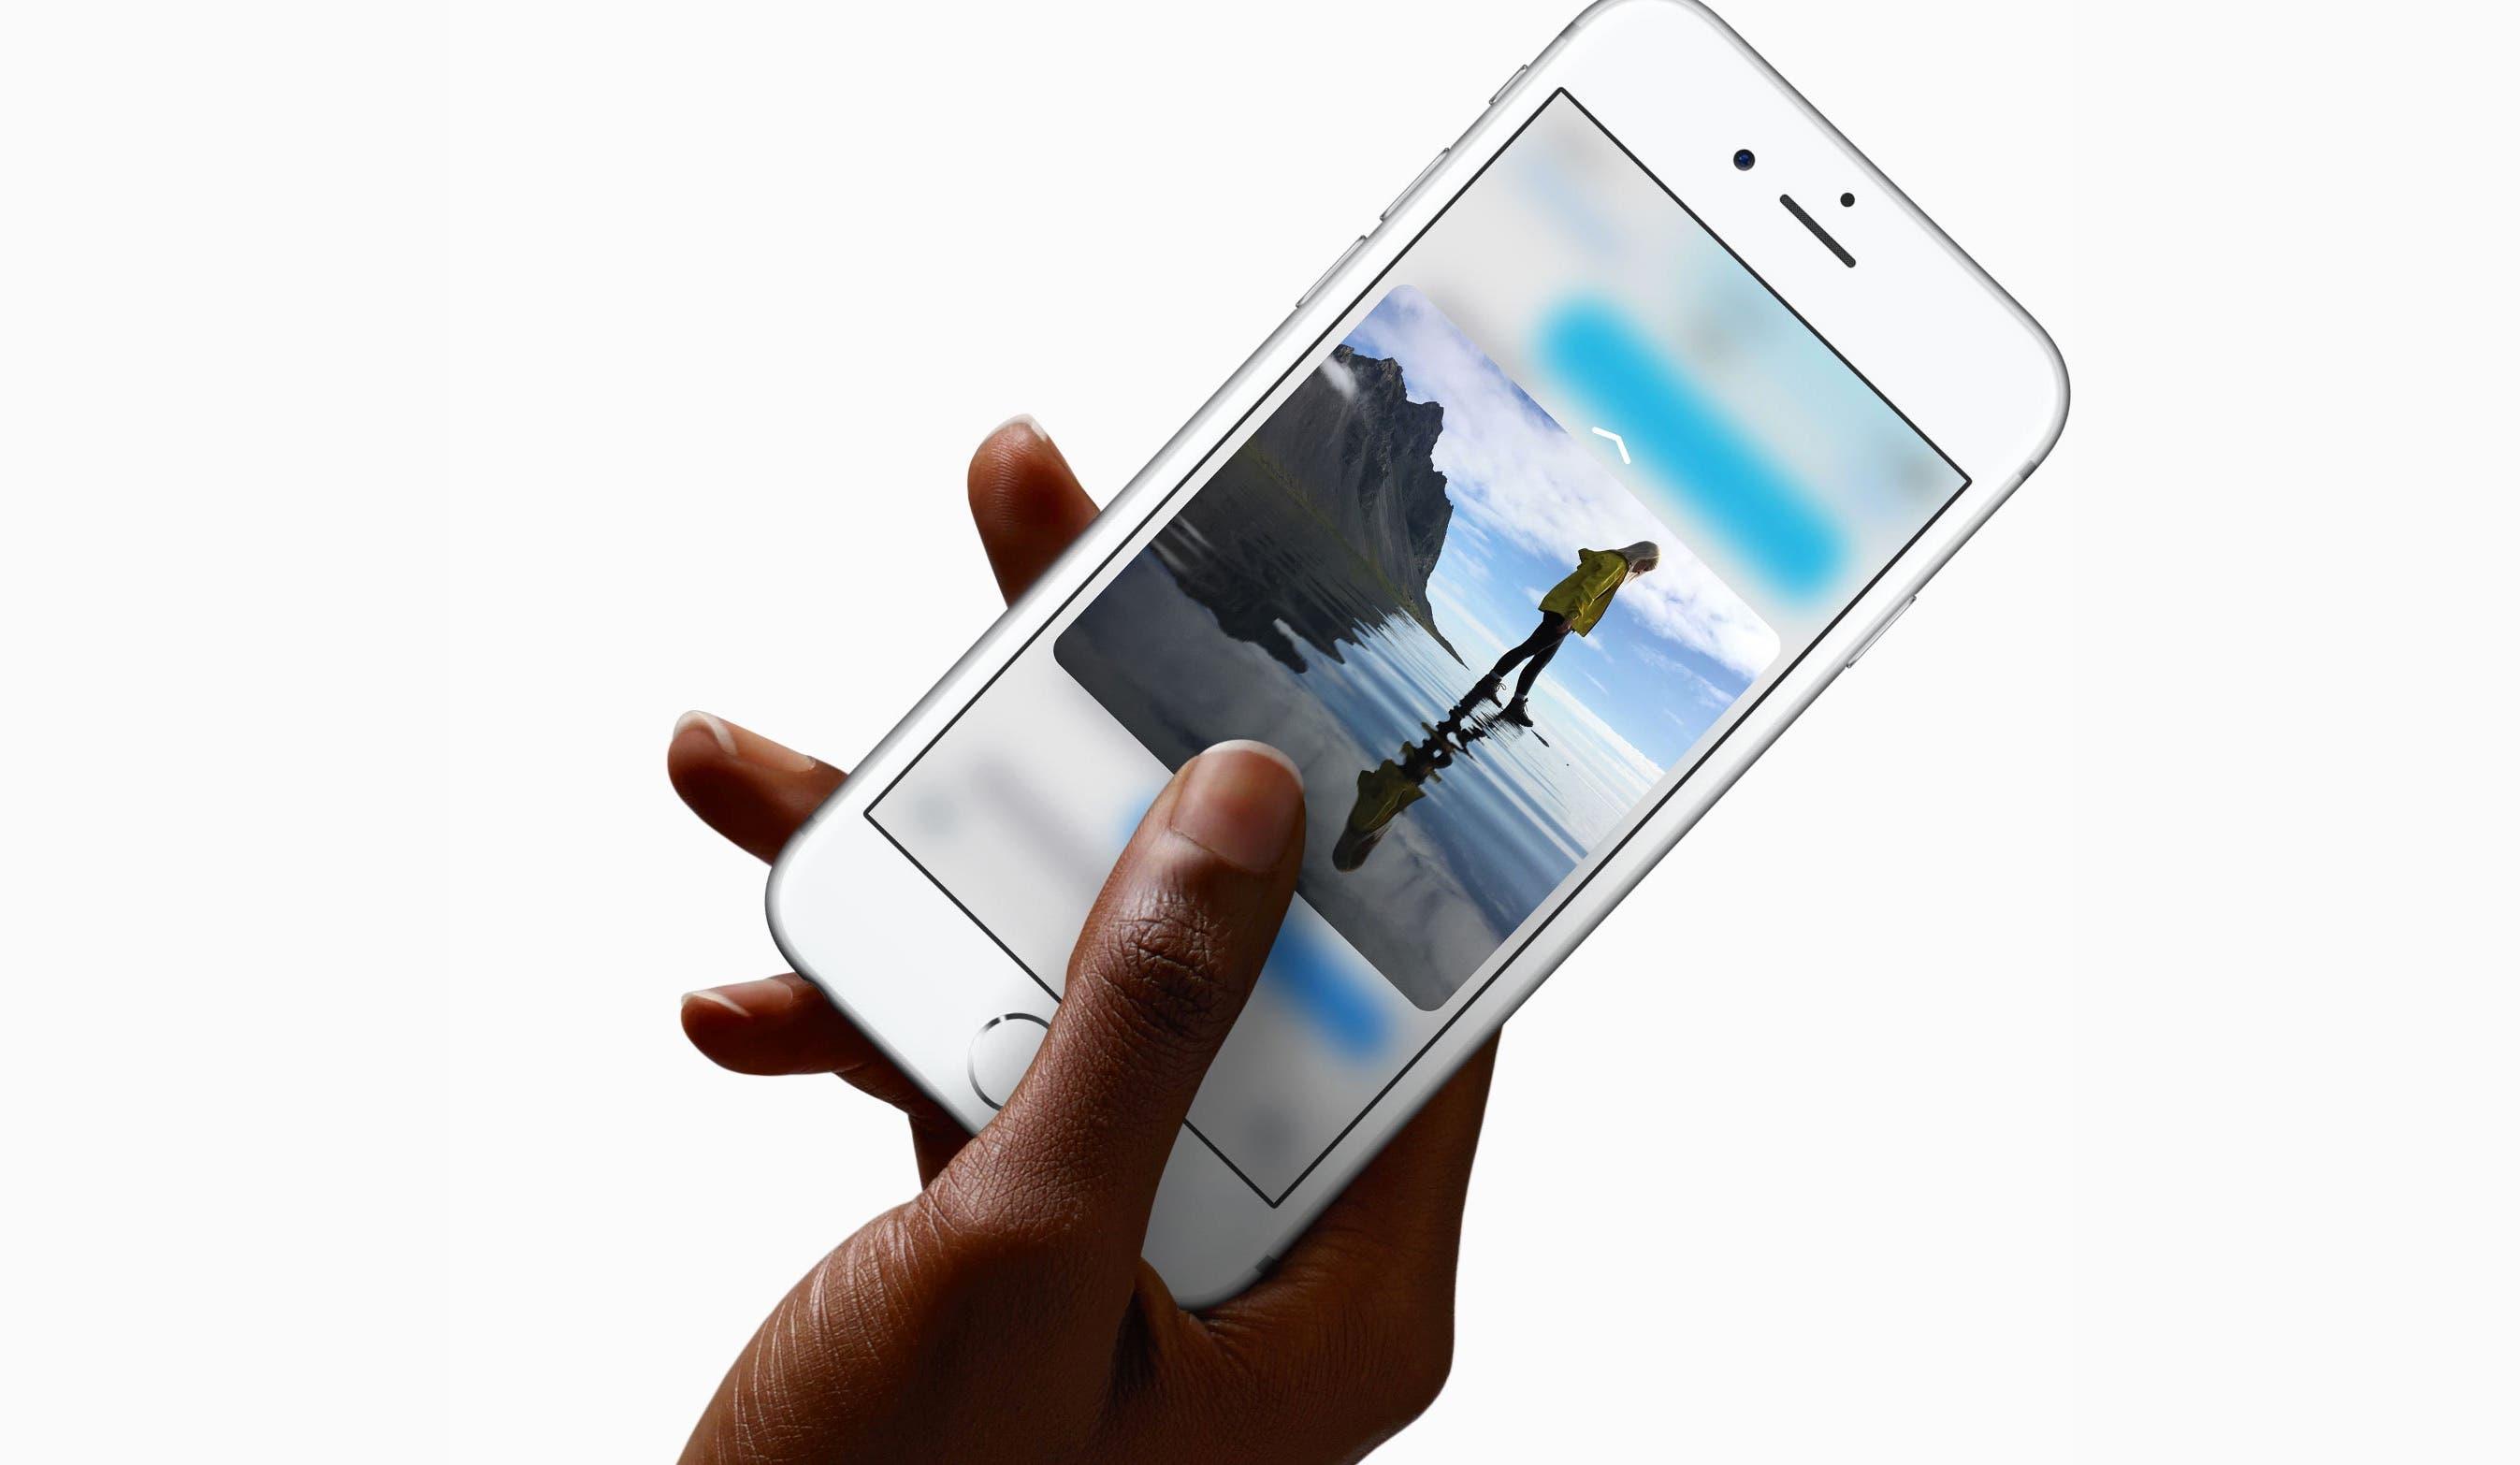 iphone-6s-3d-touch_2 One's Two Cents: Apple bekommt den Karren kaum noch aus dem Dreck